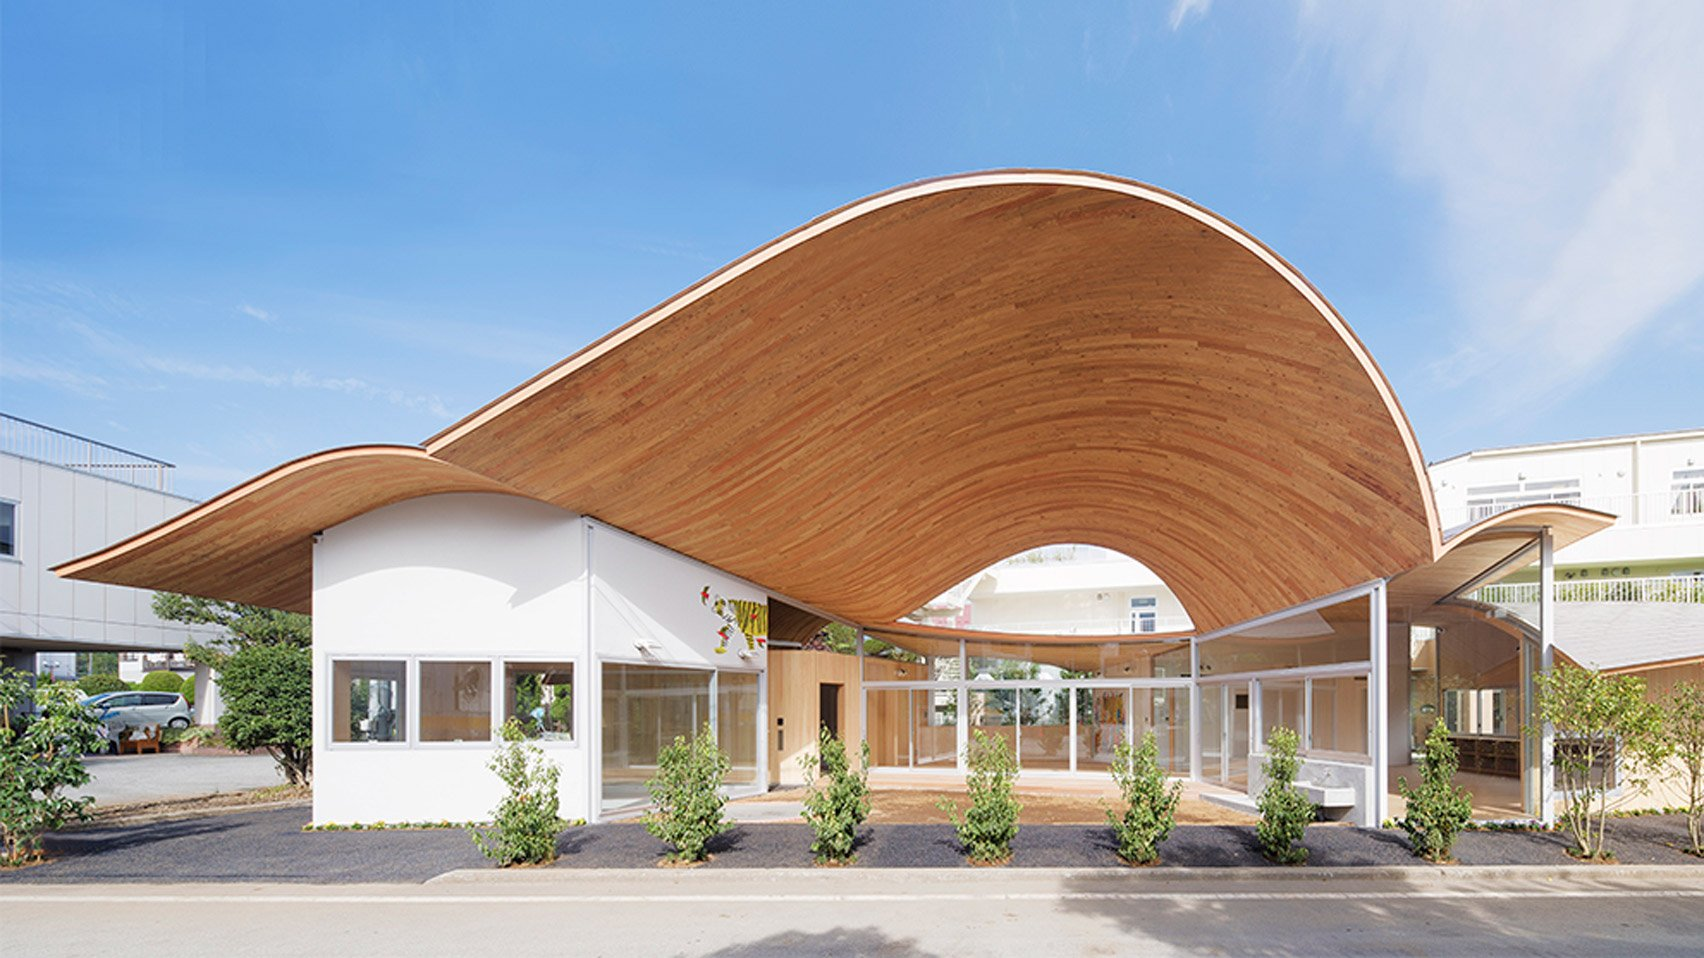 Takashige Yamashita Creates Nursery With Curving Timber Roof Near Mount Fuji